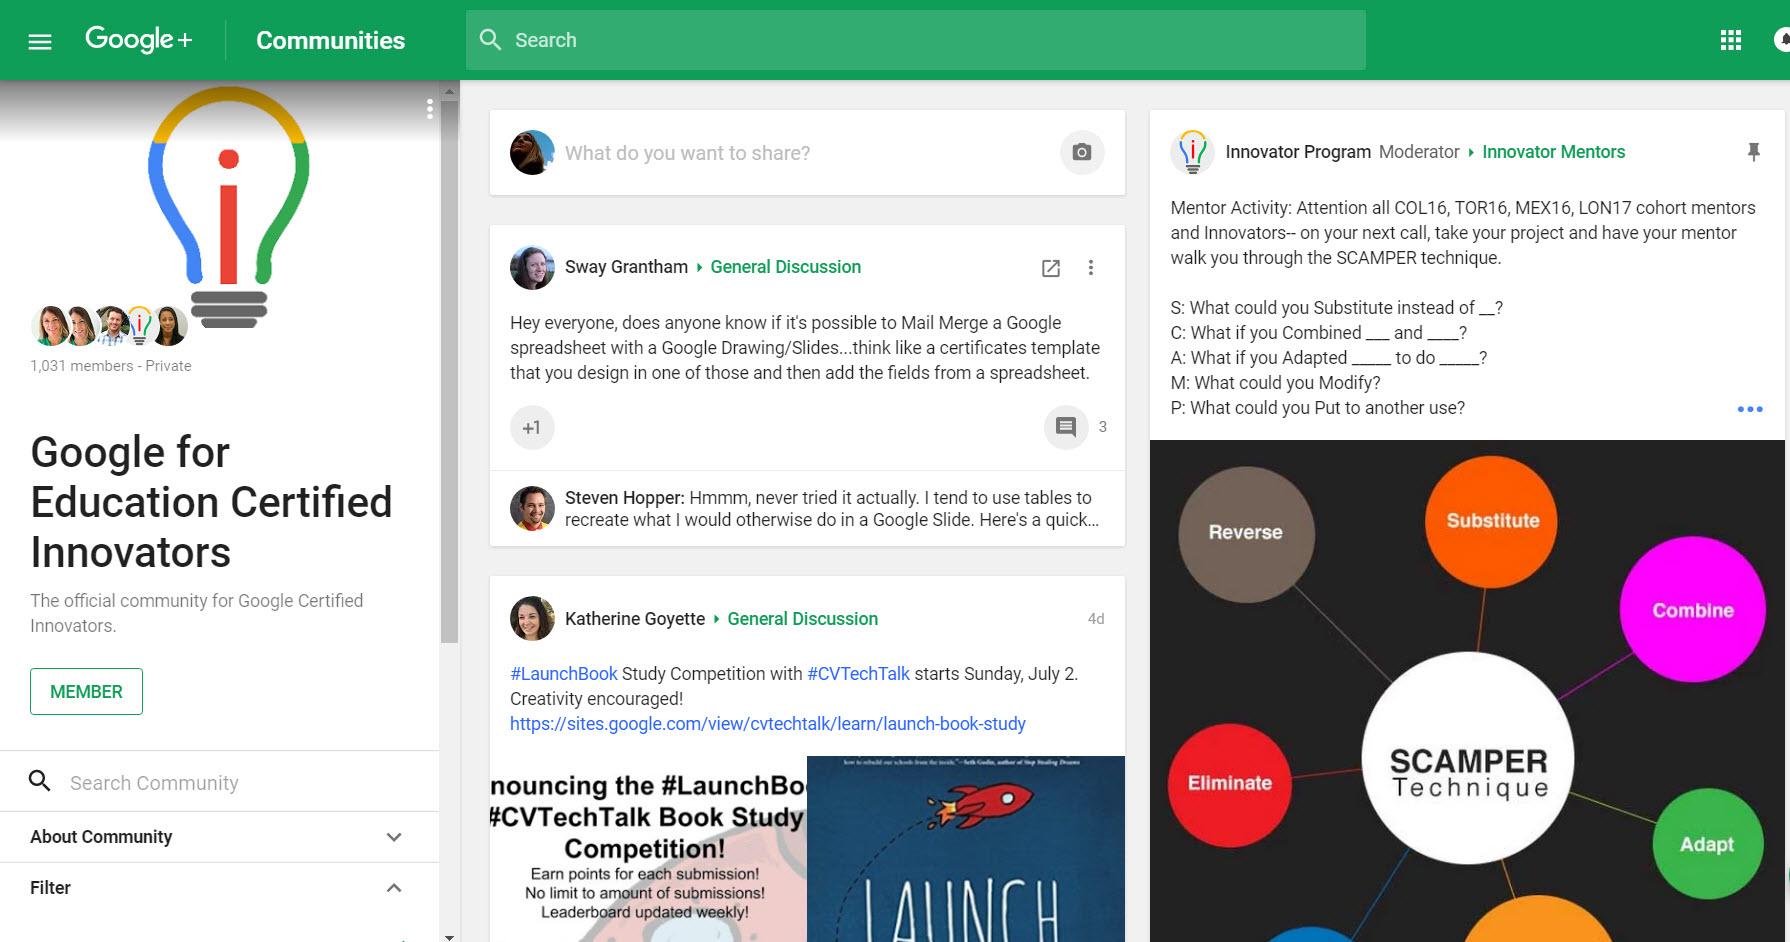 Google Innovator Community